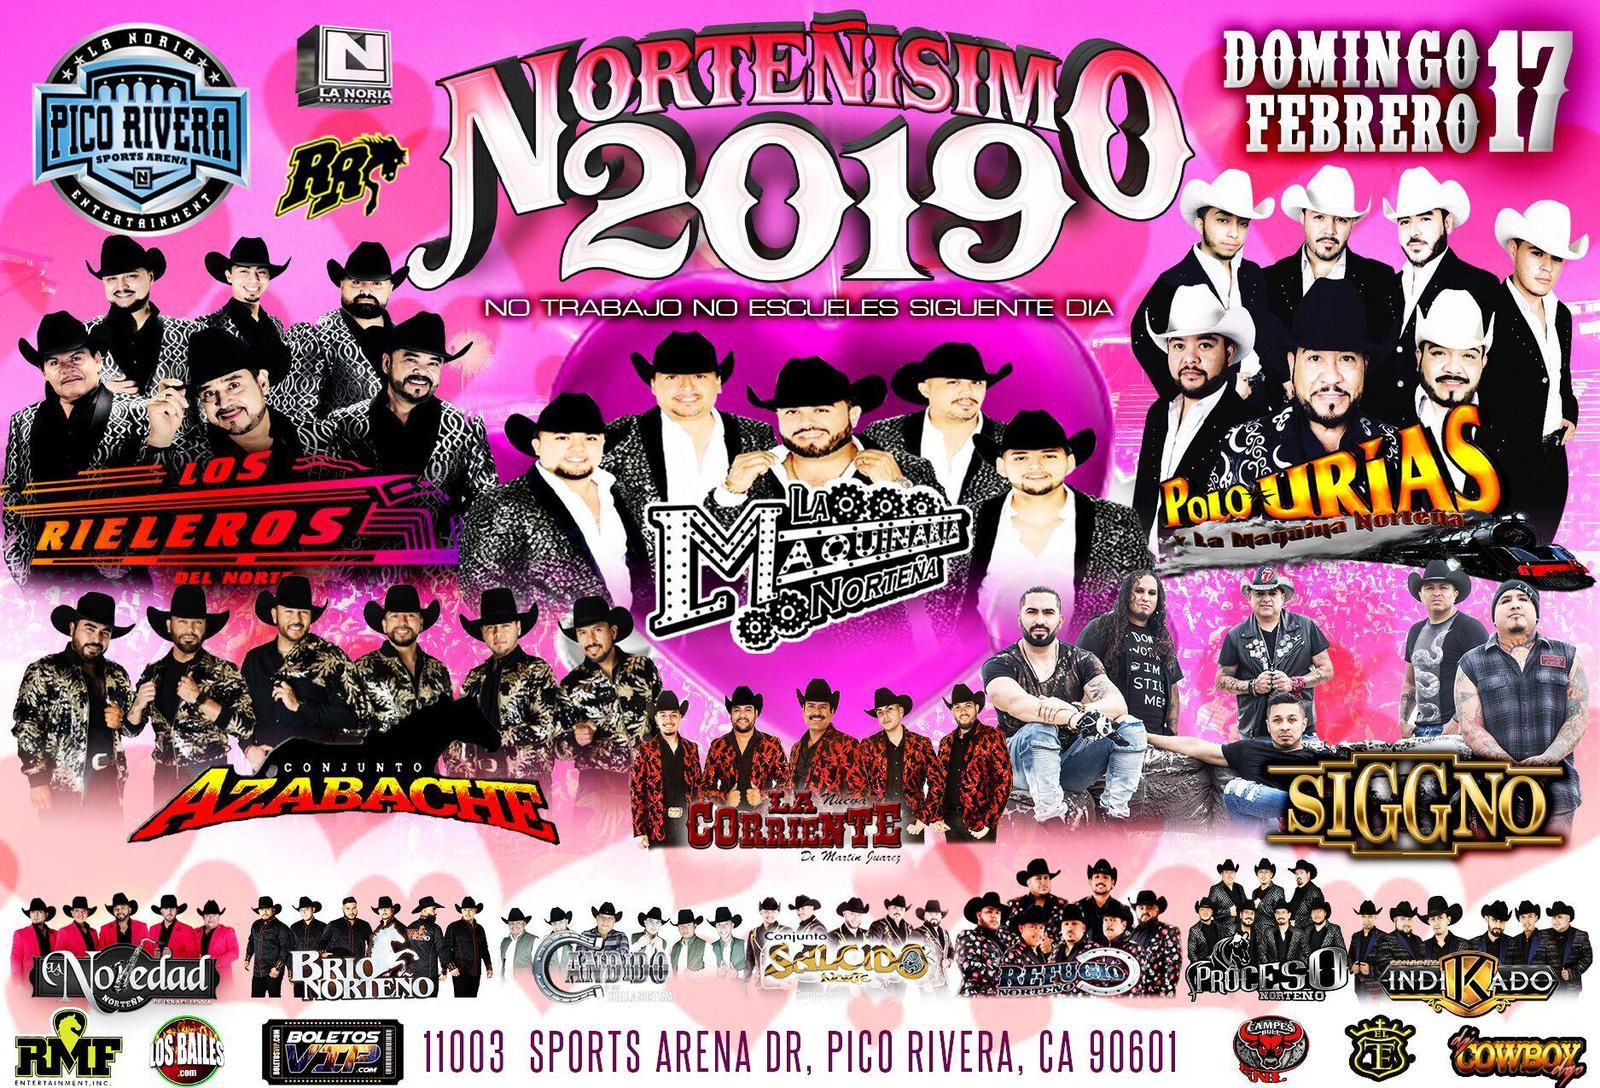 Buy Tickets To Nortenisimo 2019 Rieleros Maquinaria P Urias Azabache